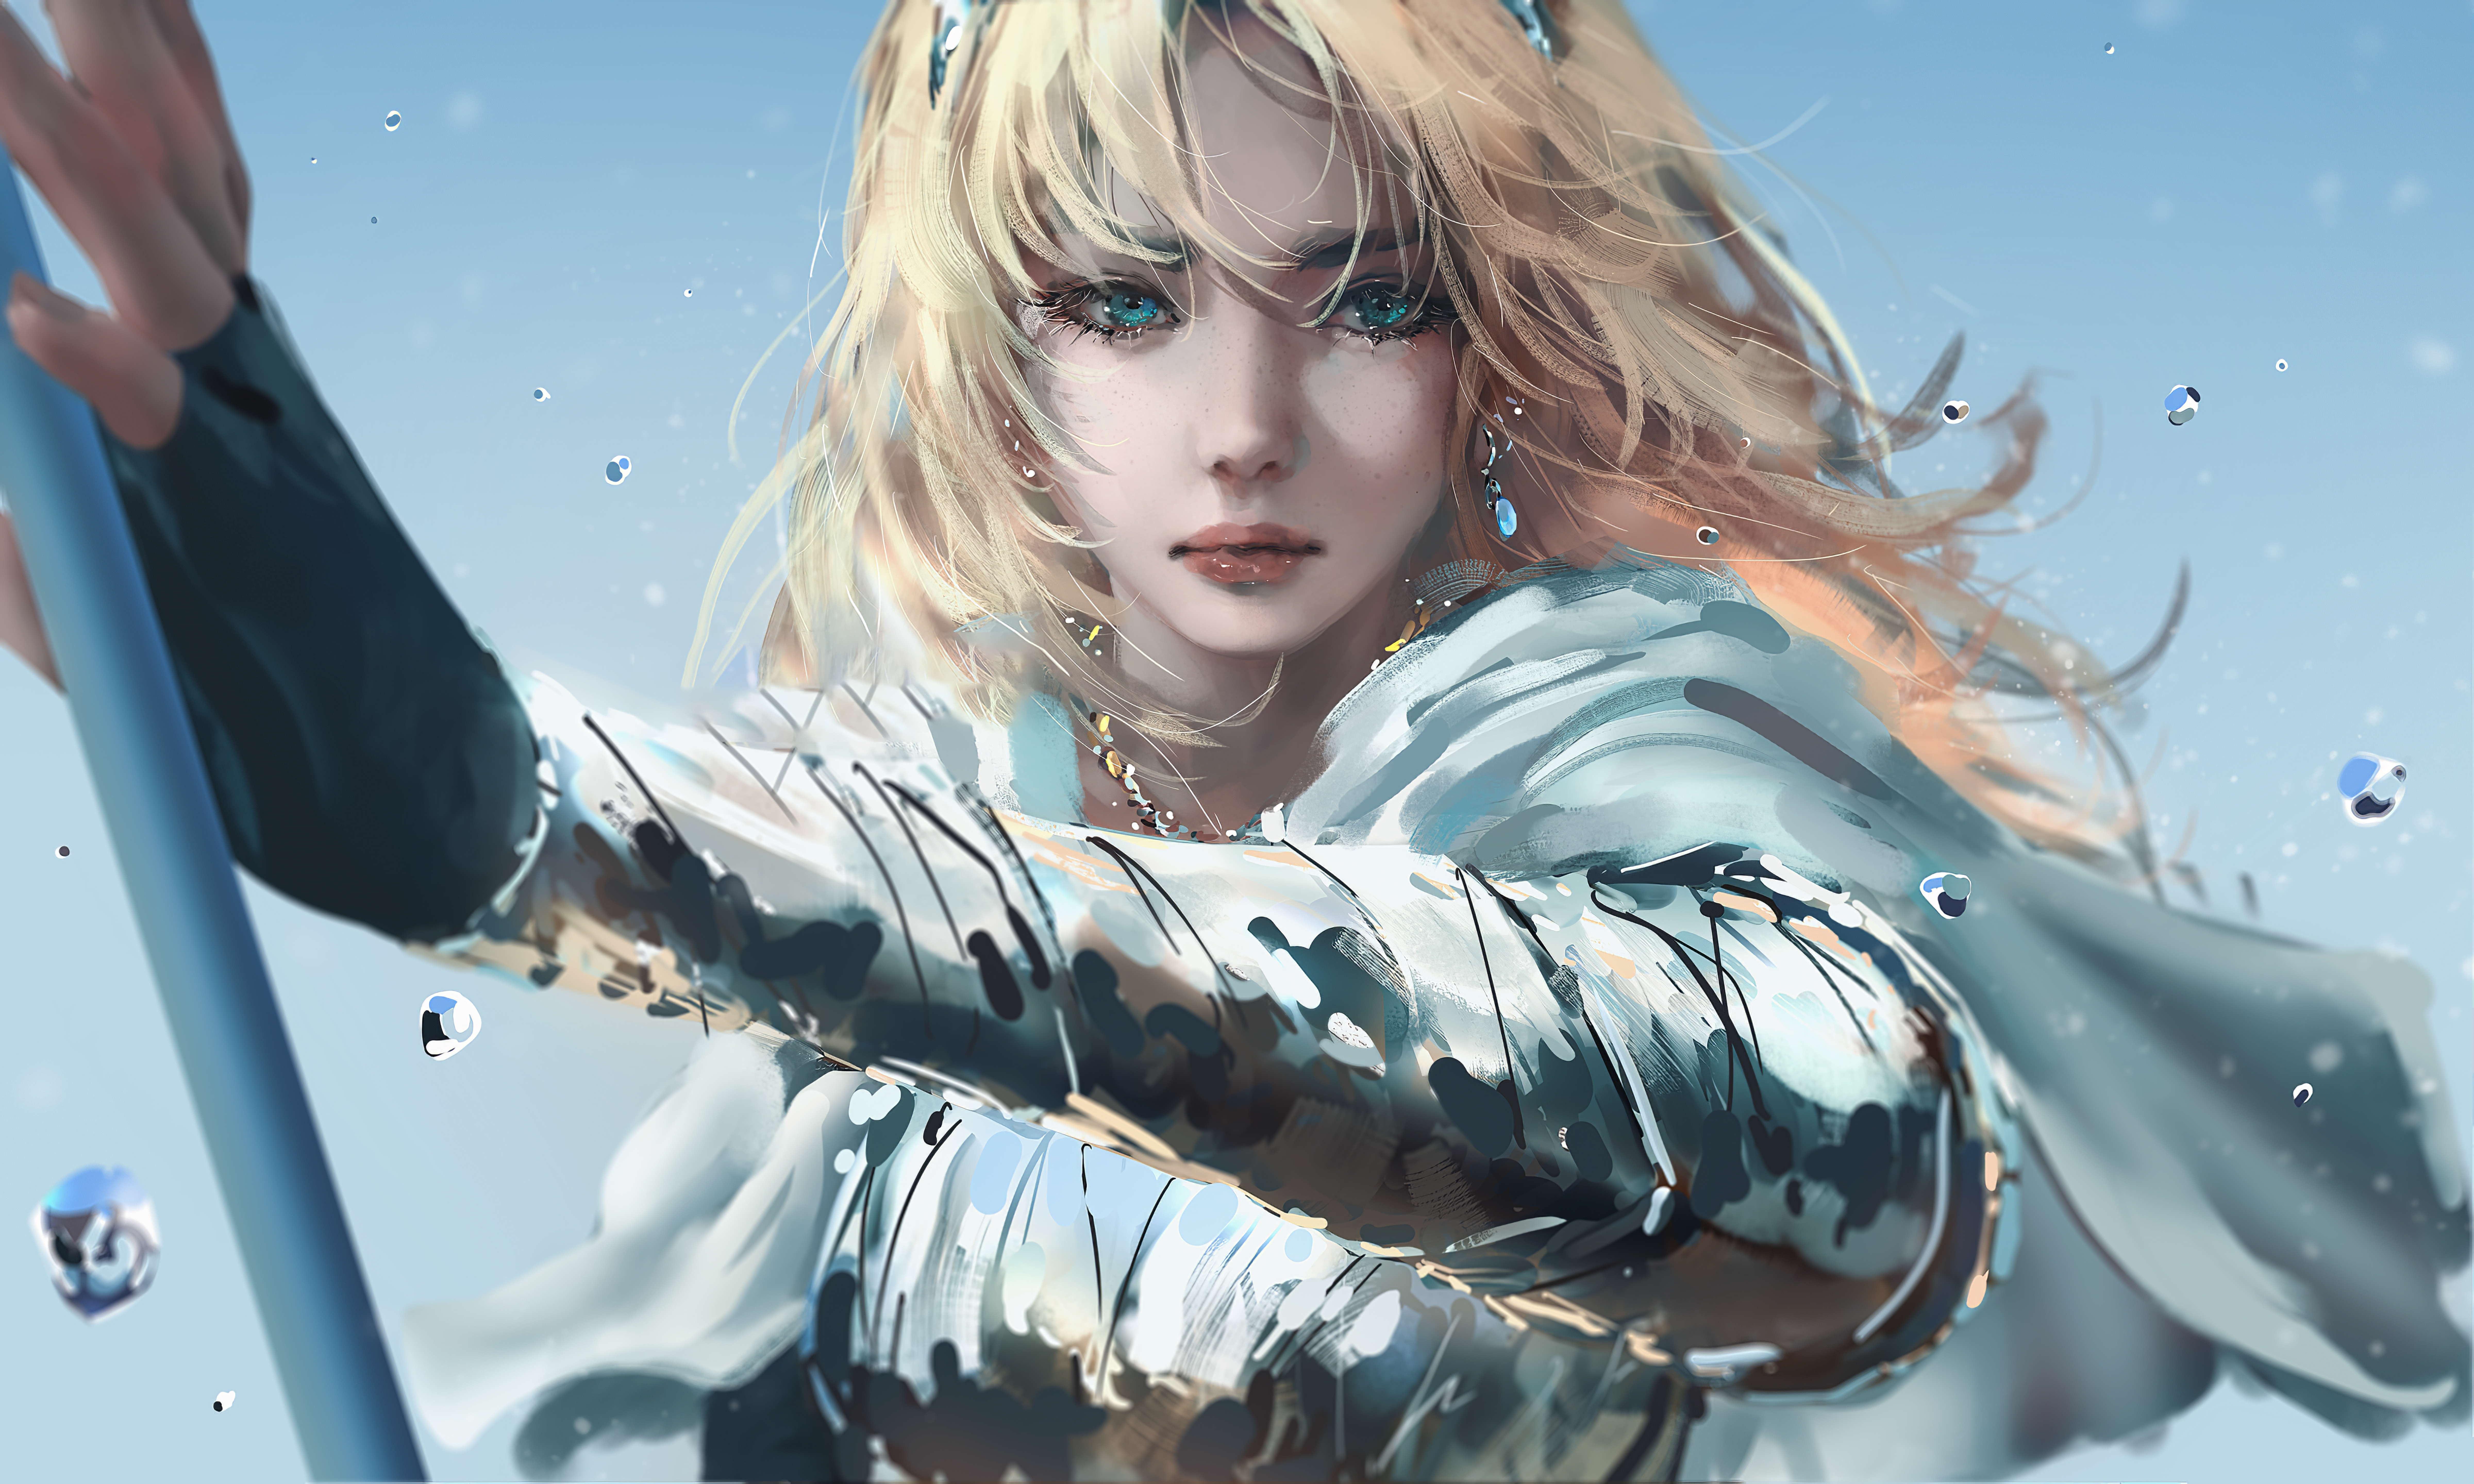 General 9600x5760 League of Legends Lux (League of Legends) video game art Nixeu PC gaming video game girls aqua eyes fantasy art blonde long hair looking at viewer fantasy girl